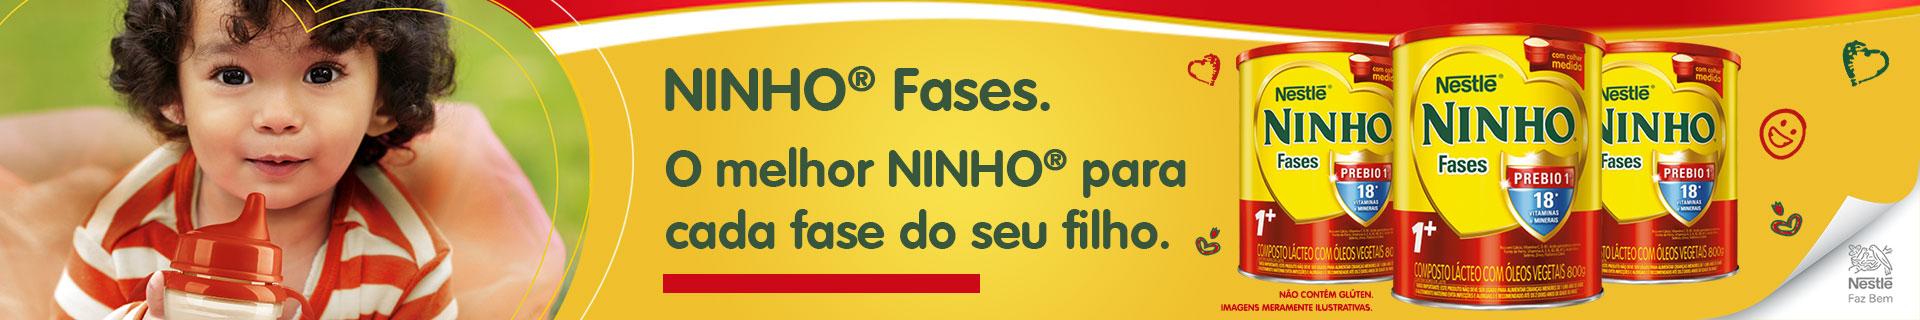 Cdf4c65582b09d4552f7f456d53f67f22efc7b201920x320 header ninho fases 1